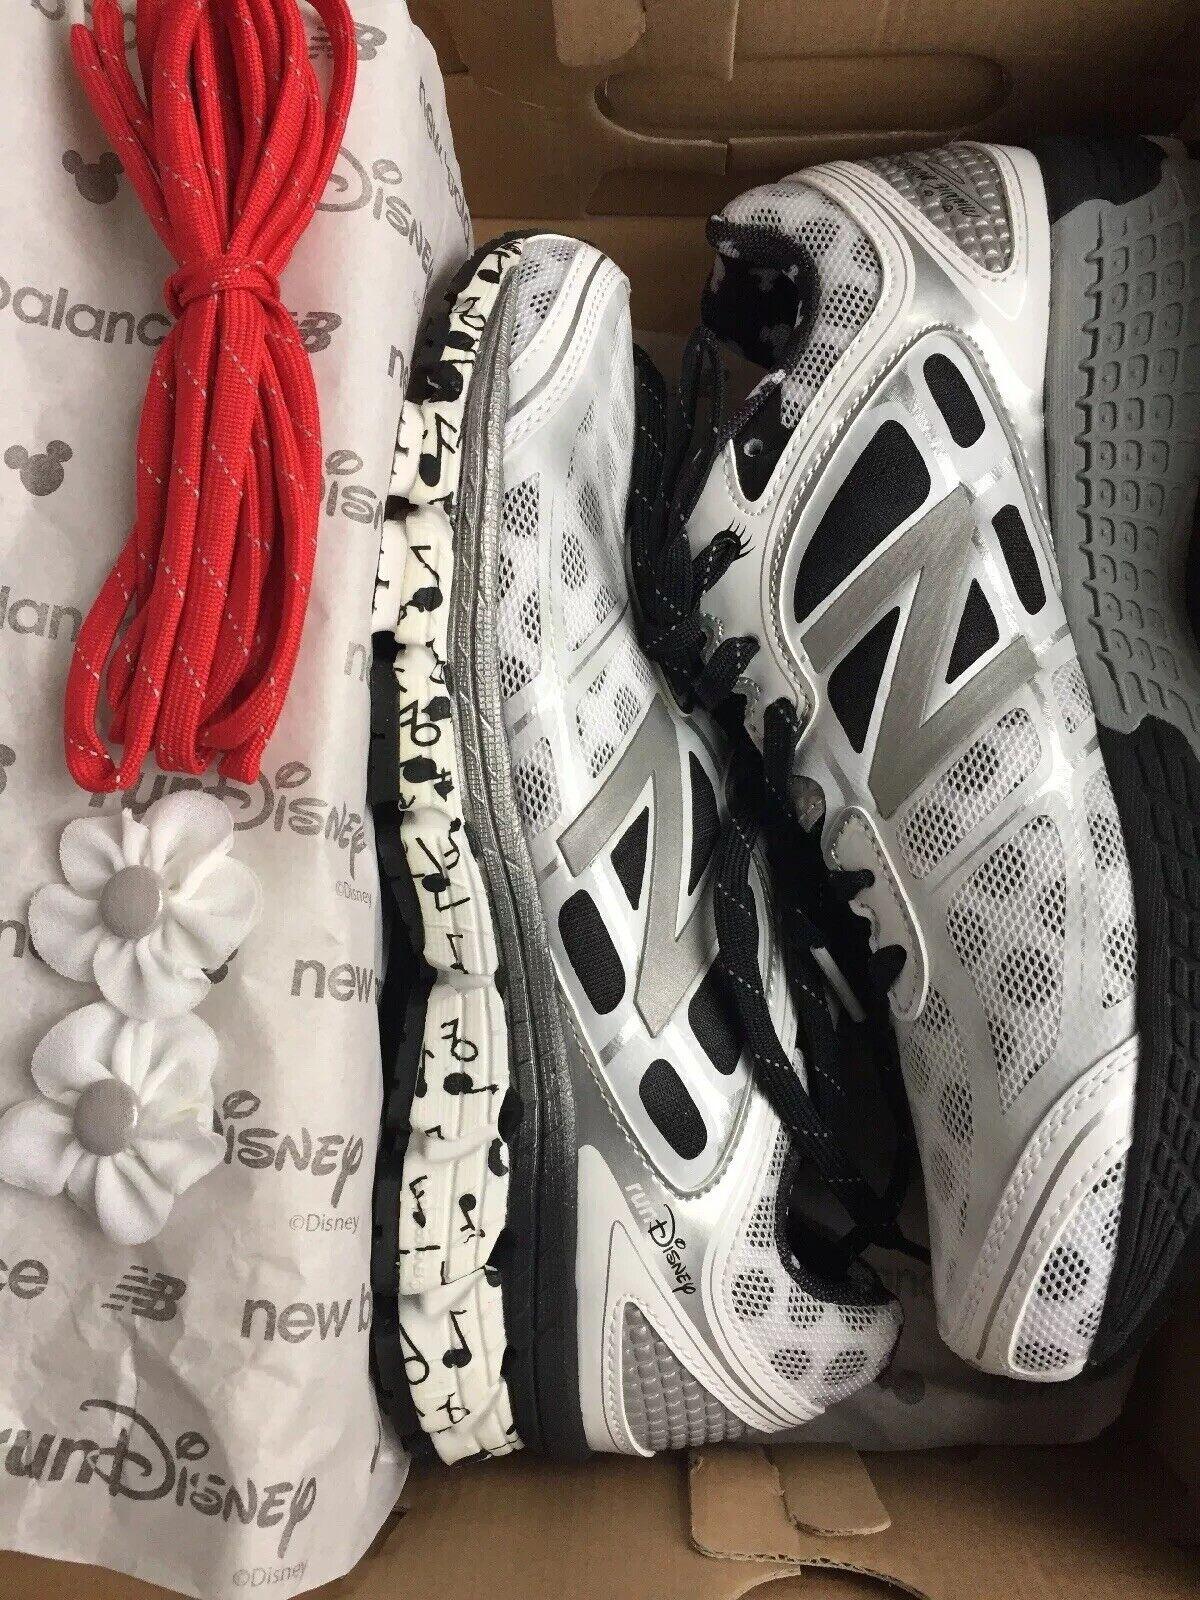 New Balance 860 RUN DISNEY MINNIE MOUSE 2015 scarpe  Dimensione 7.5 US RUNDISNEY NIB  si affrettò a vedere